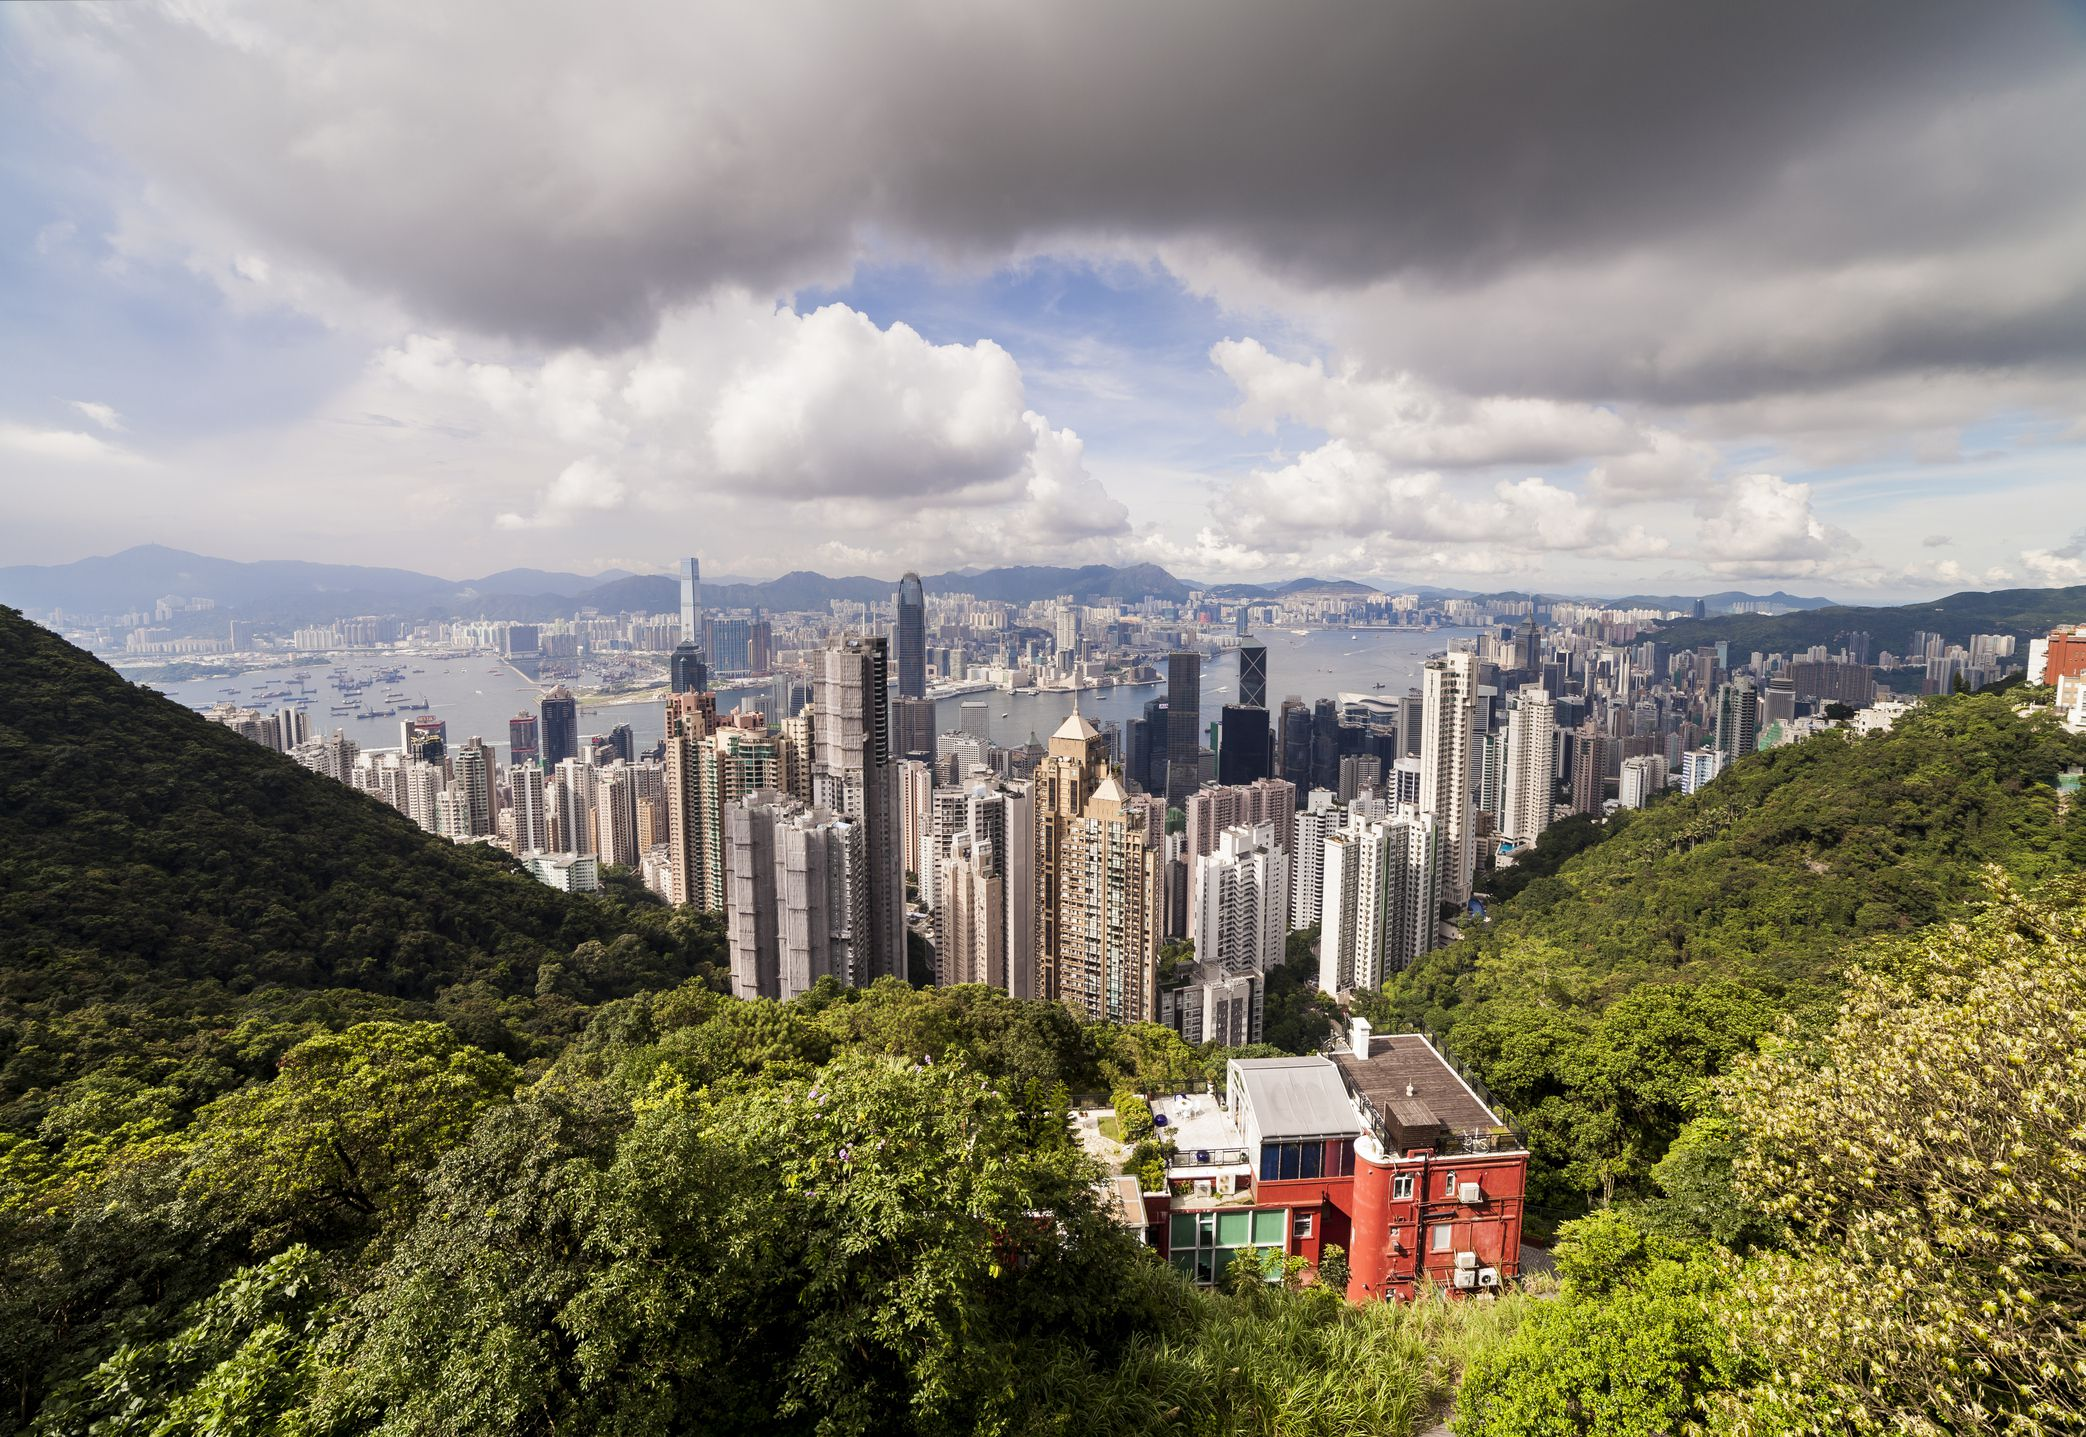 Skyline de la ciudad de Hong Kong